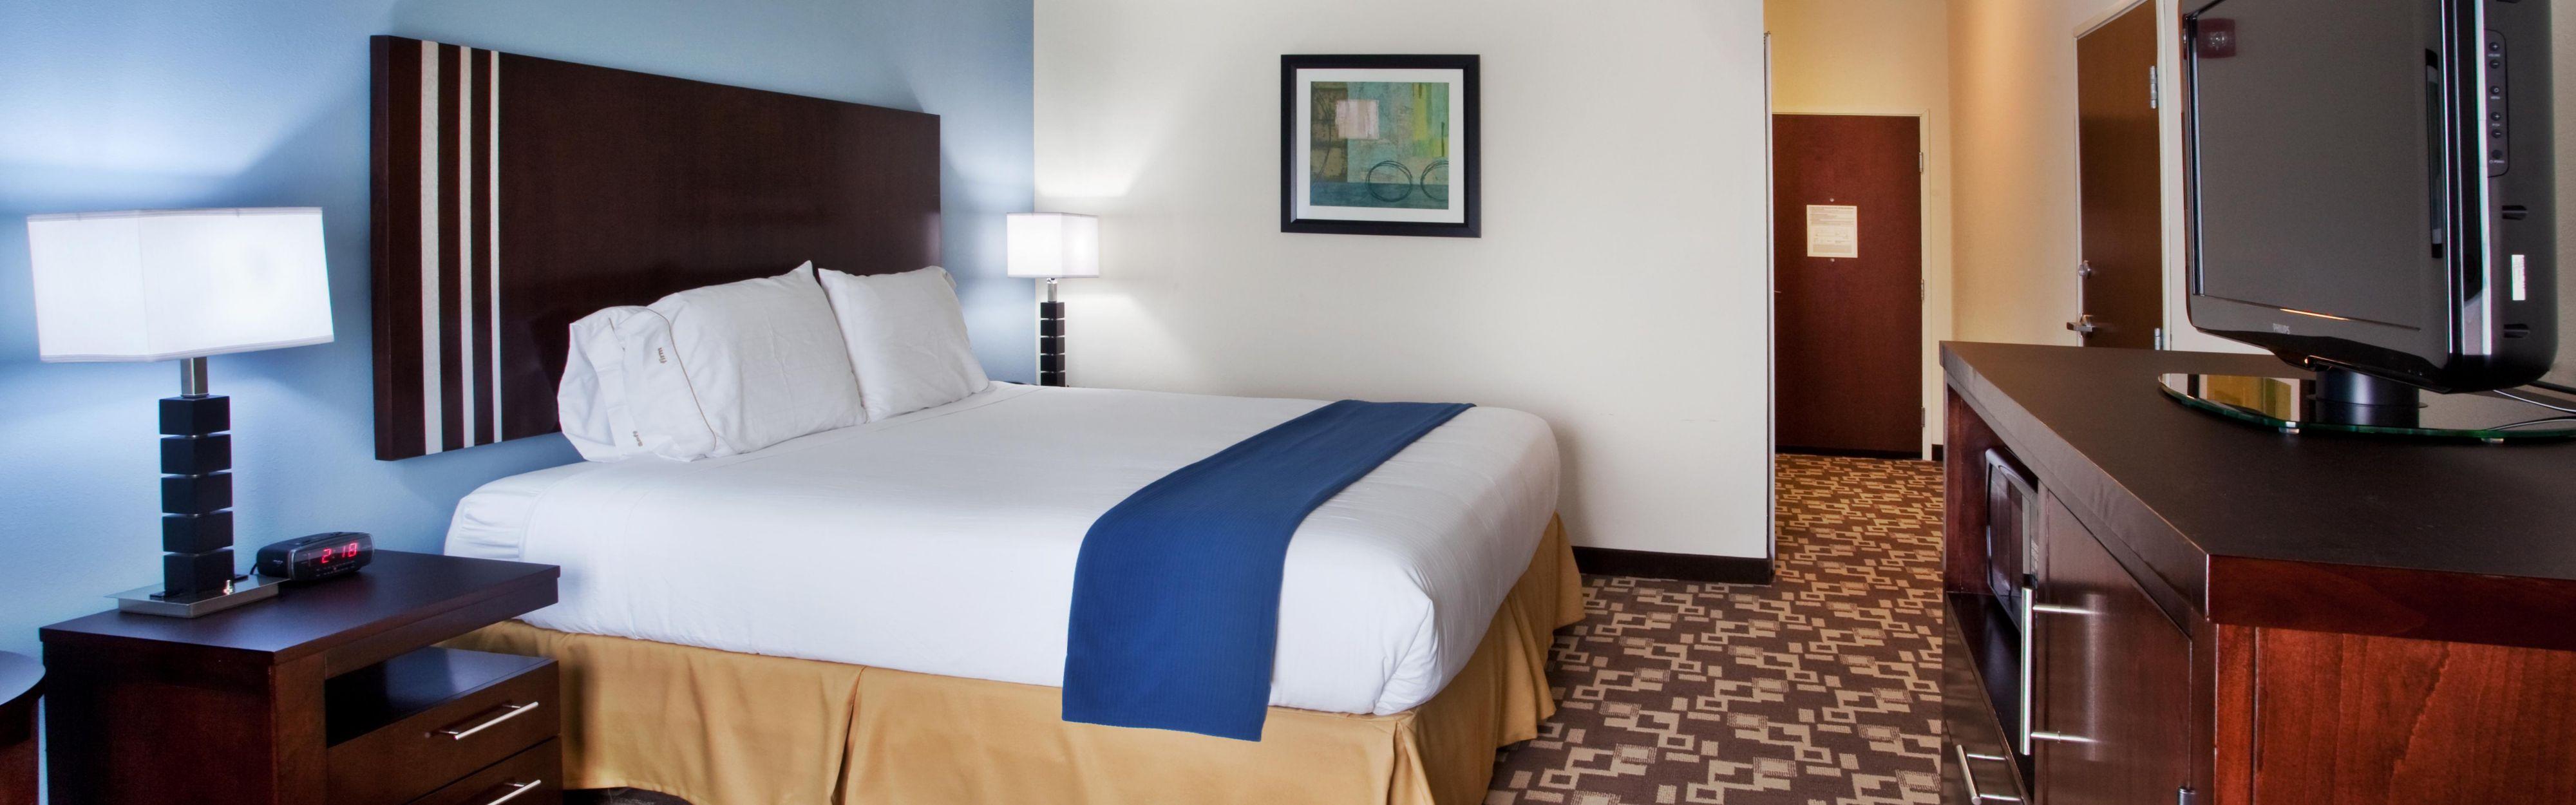 Holiday Inn Express & Suites Atlanta Arpt West - Camp Creek image 1